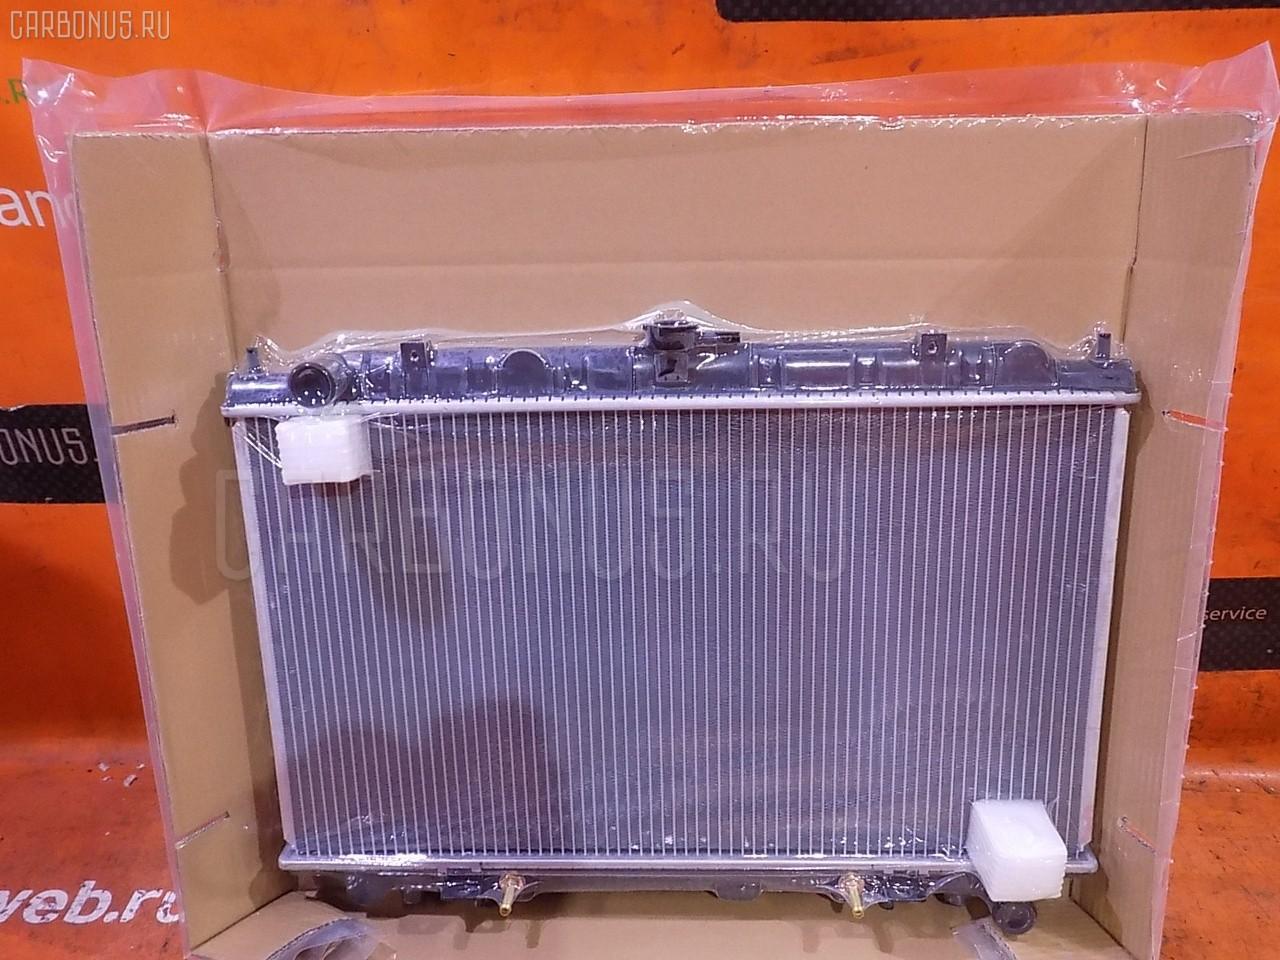 Радиатор ДВС TADASHI TD-036-21403 на Nissan Maxima A32 Фото 1